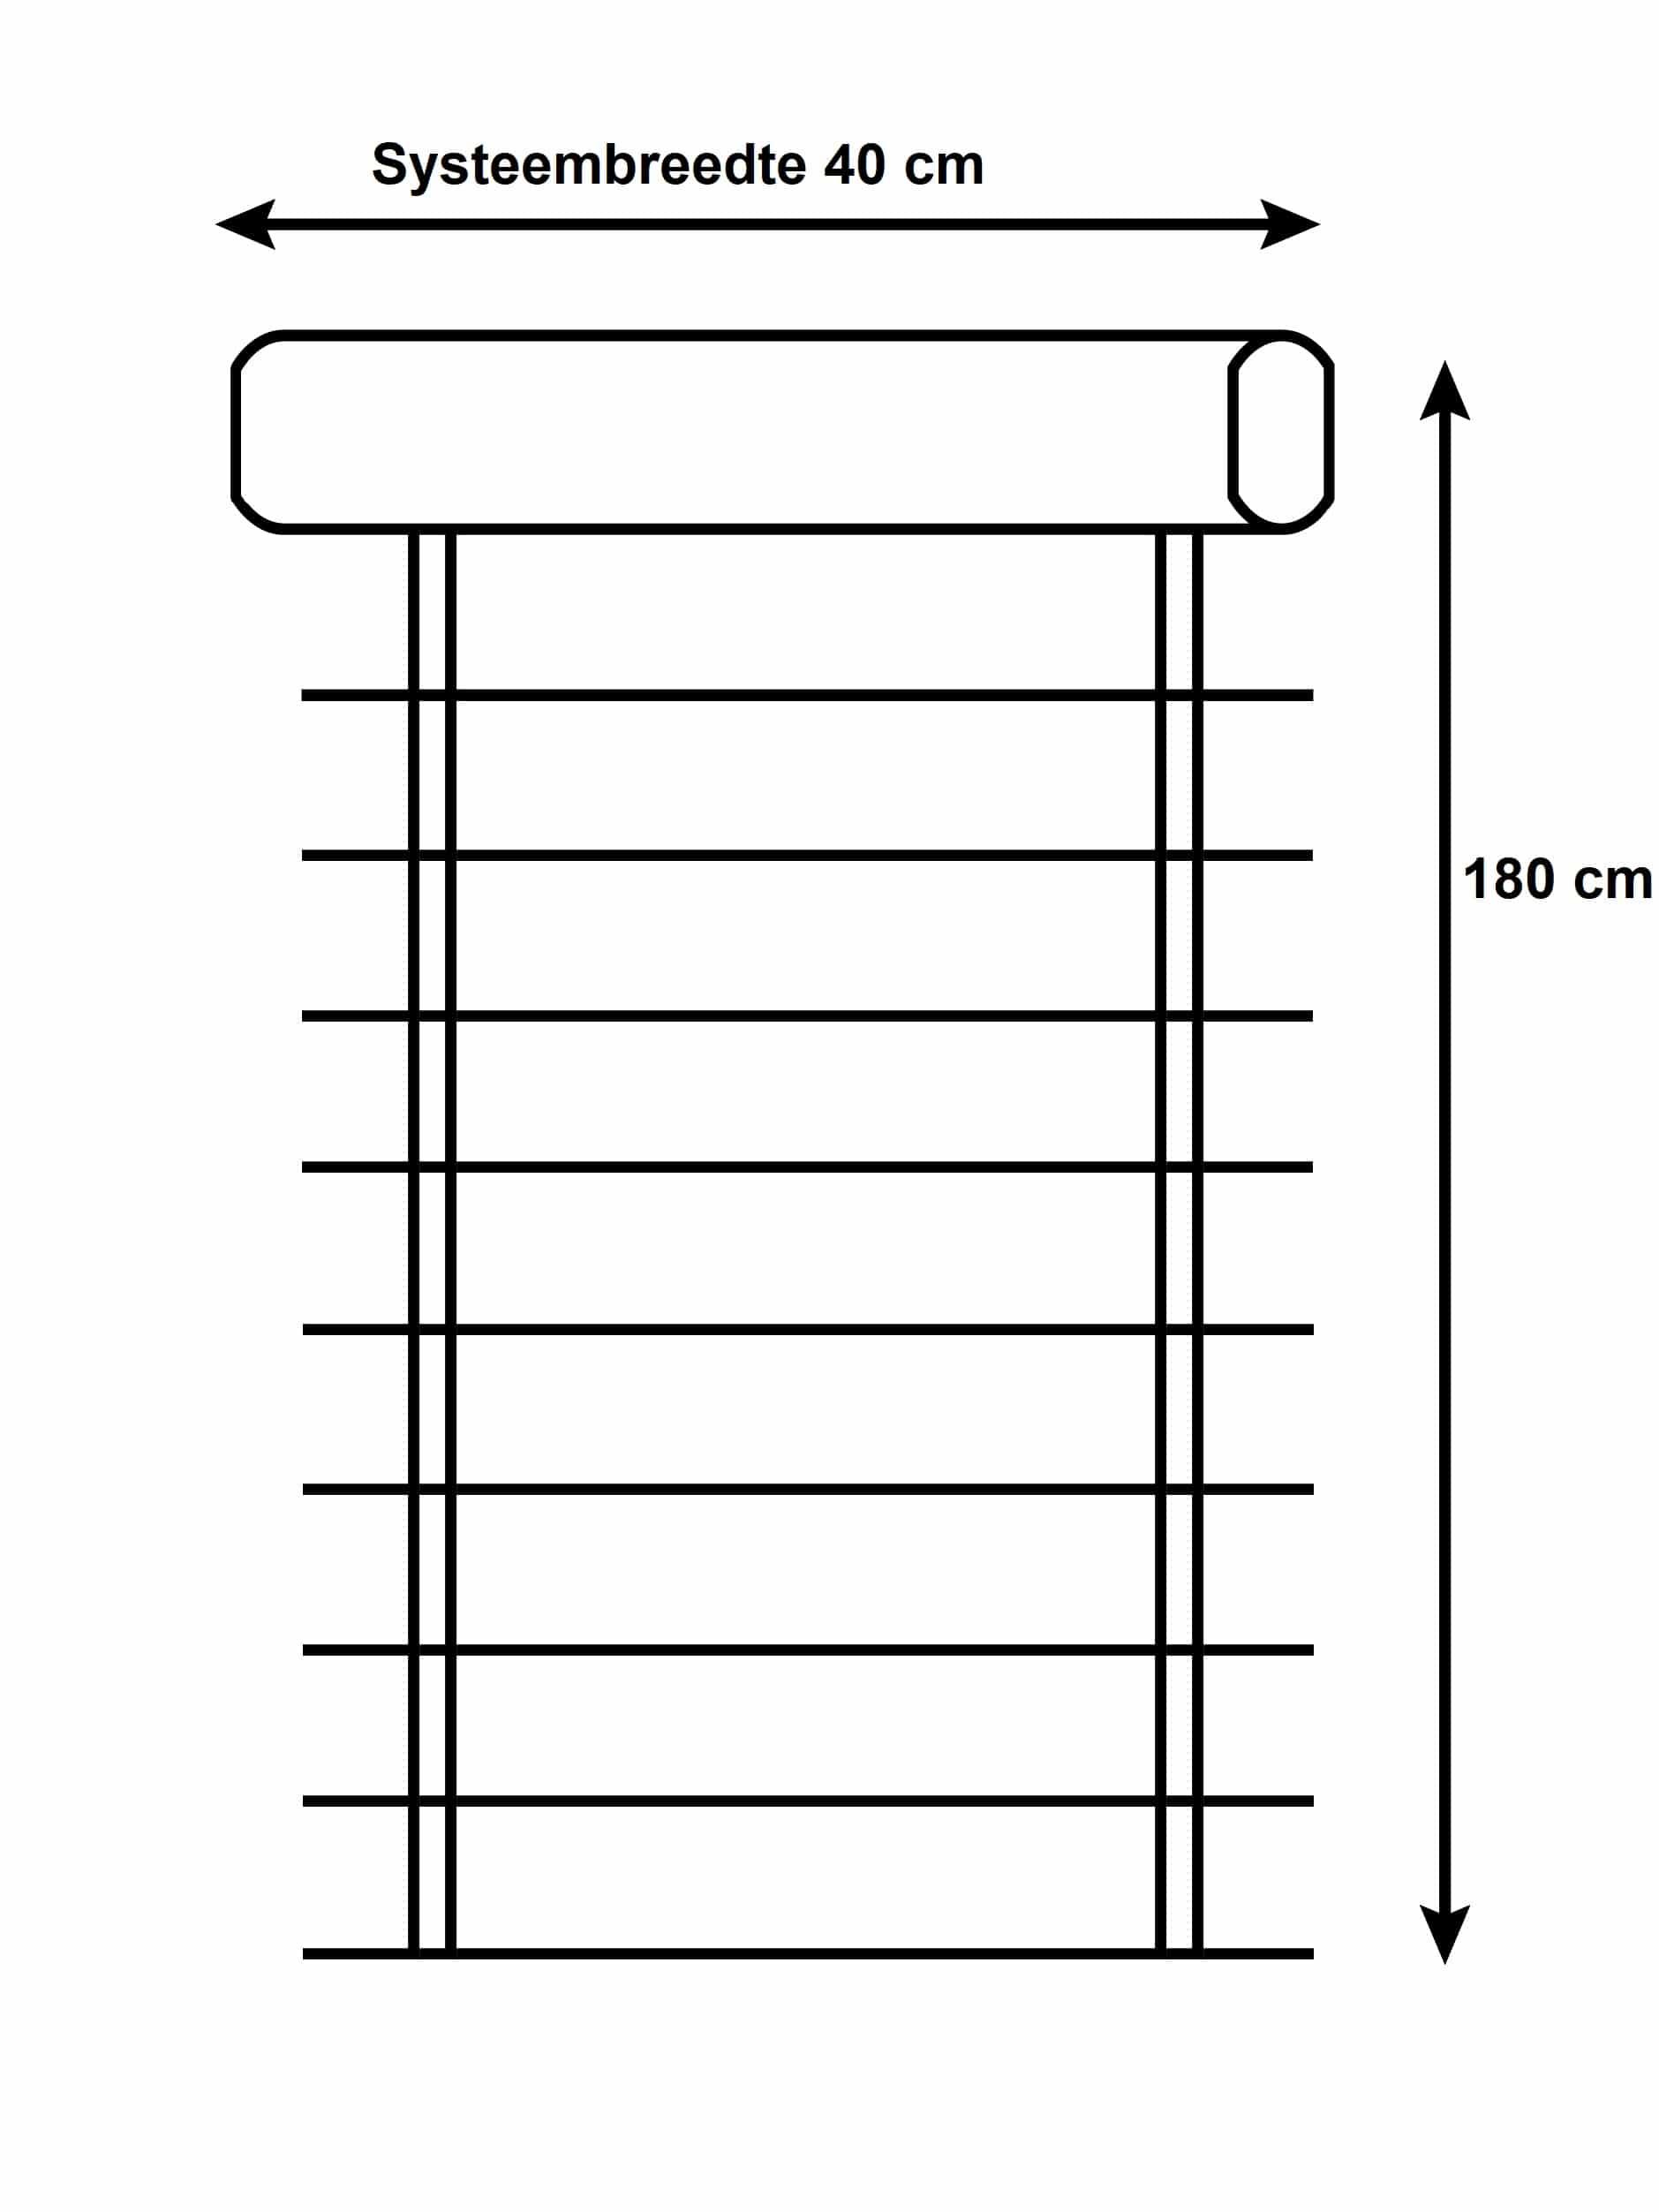 4Goodz Vochtbestendige PVC Jaloezie EASY 25 mm 40x180 cm - Grijs